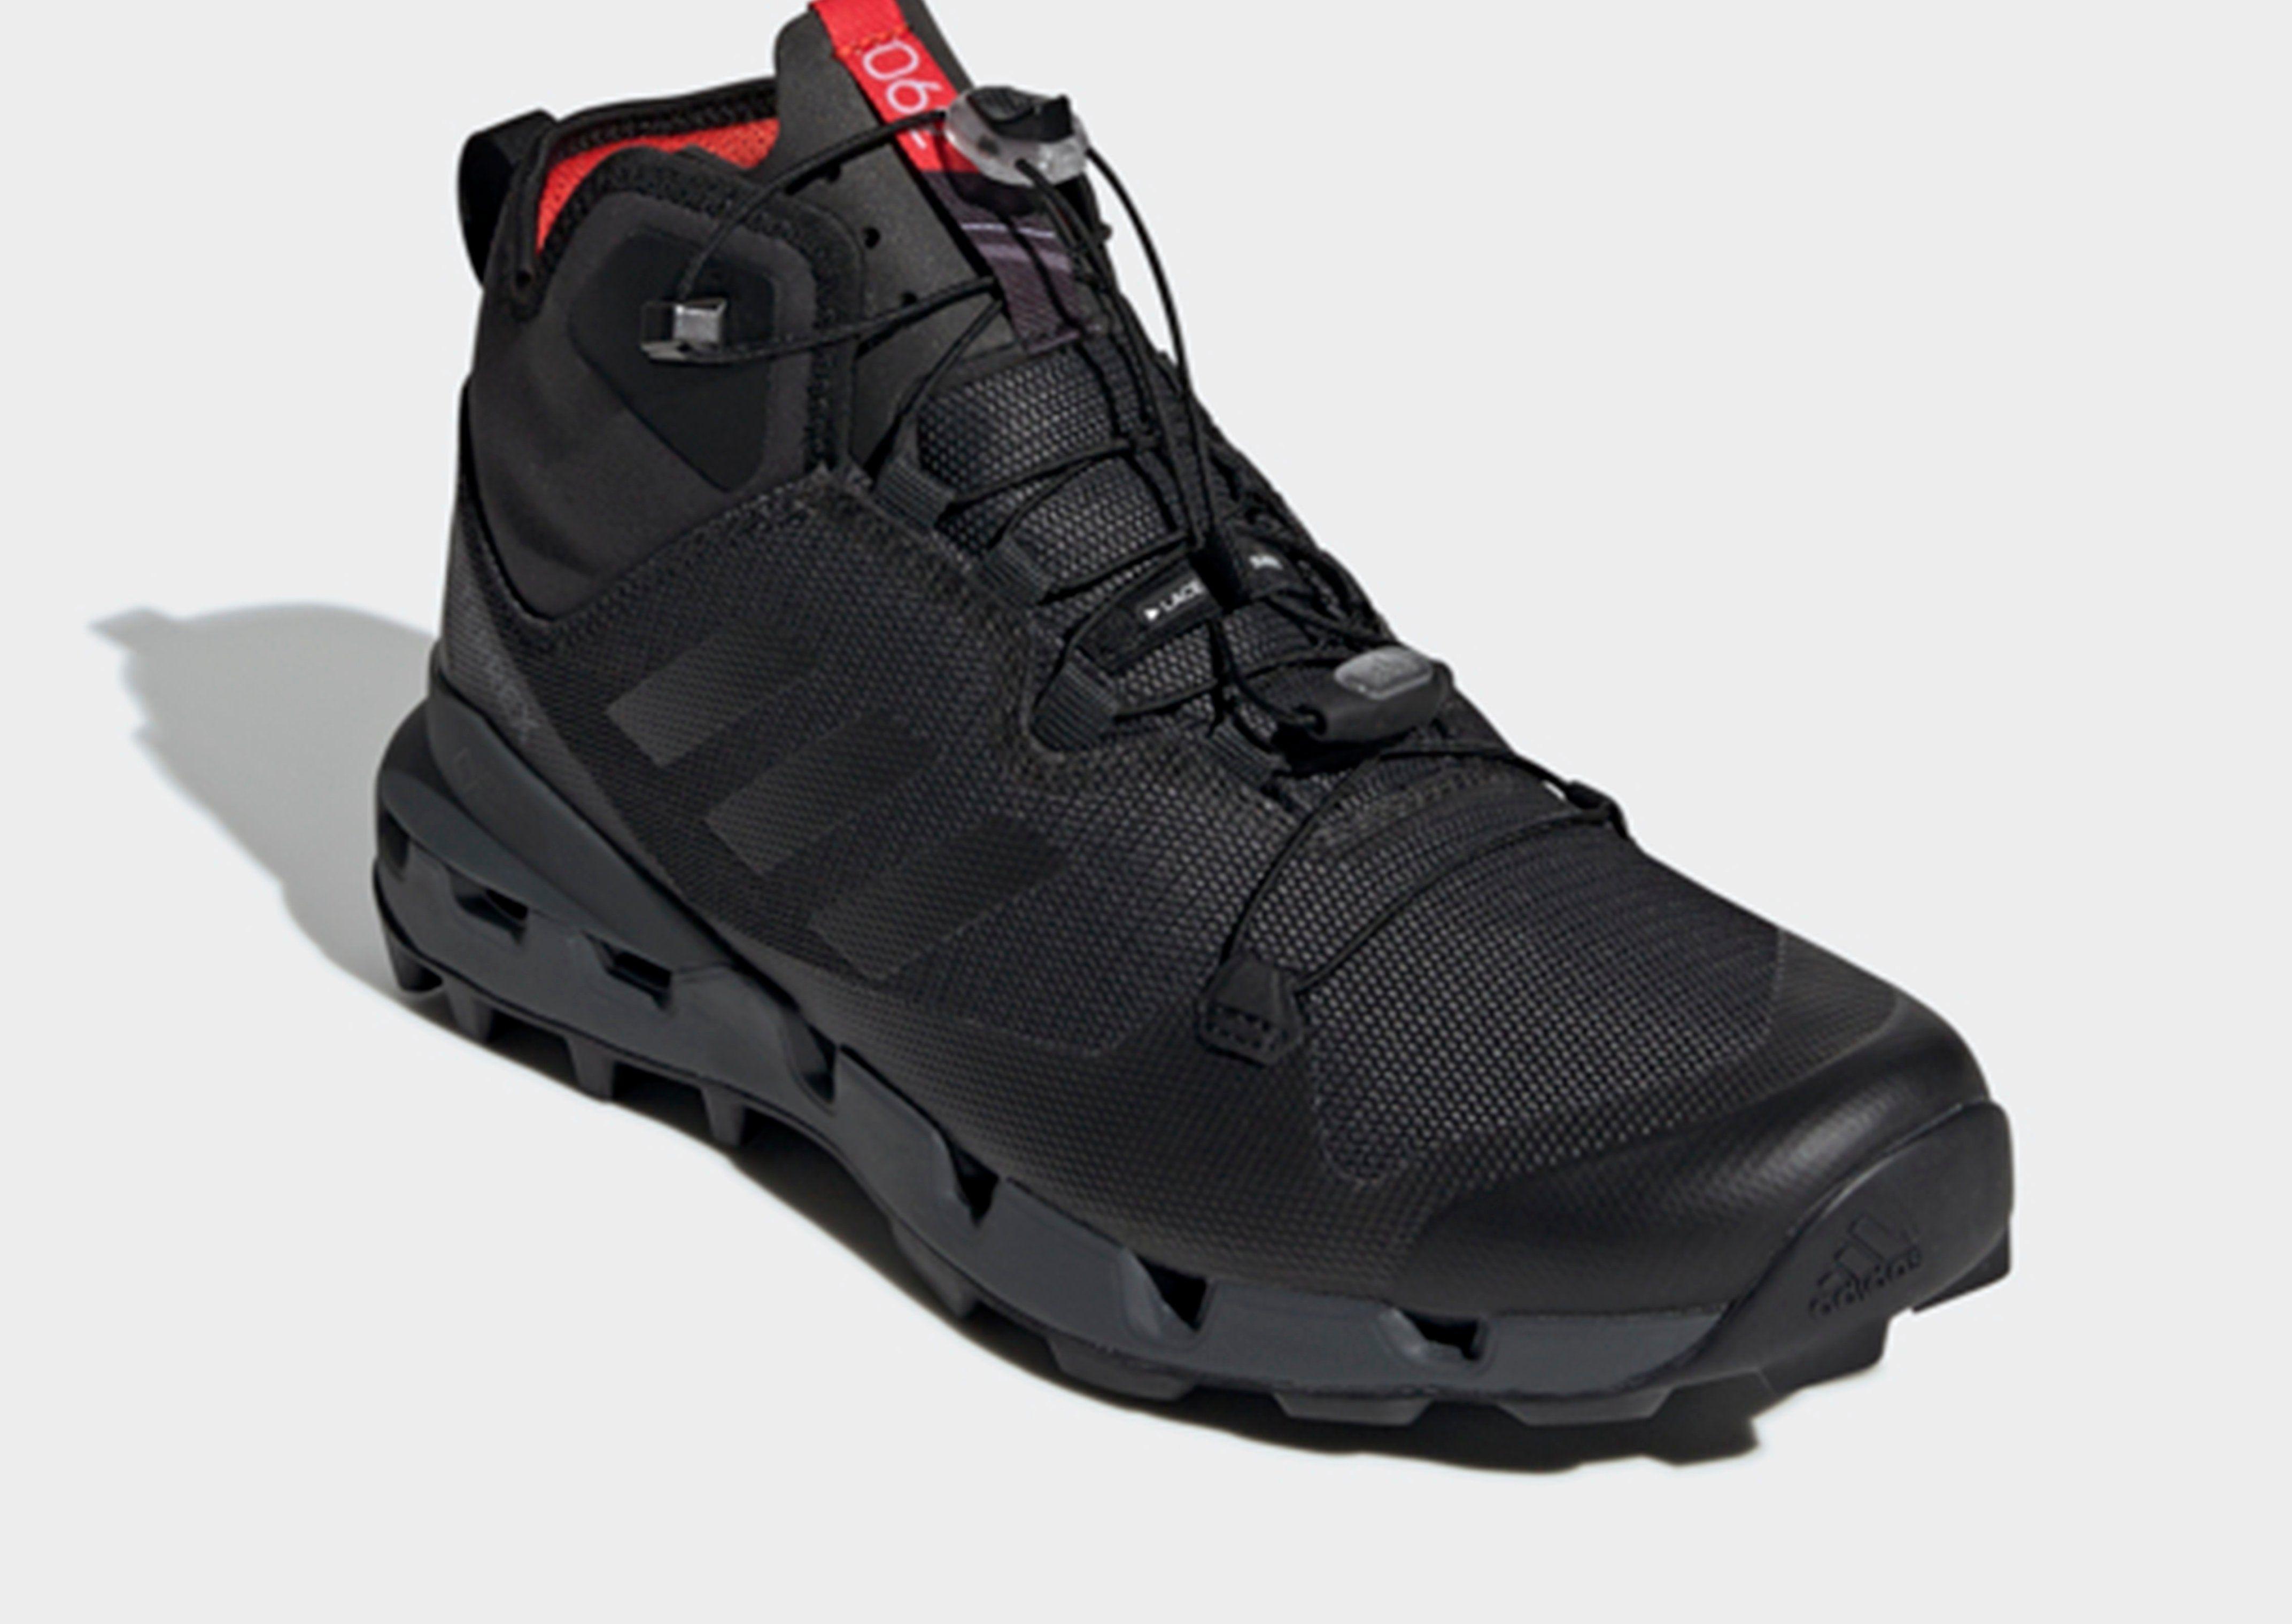 ADIDAS TERREX Fast Mid GTX-Surround Shoes